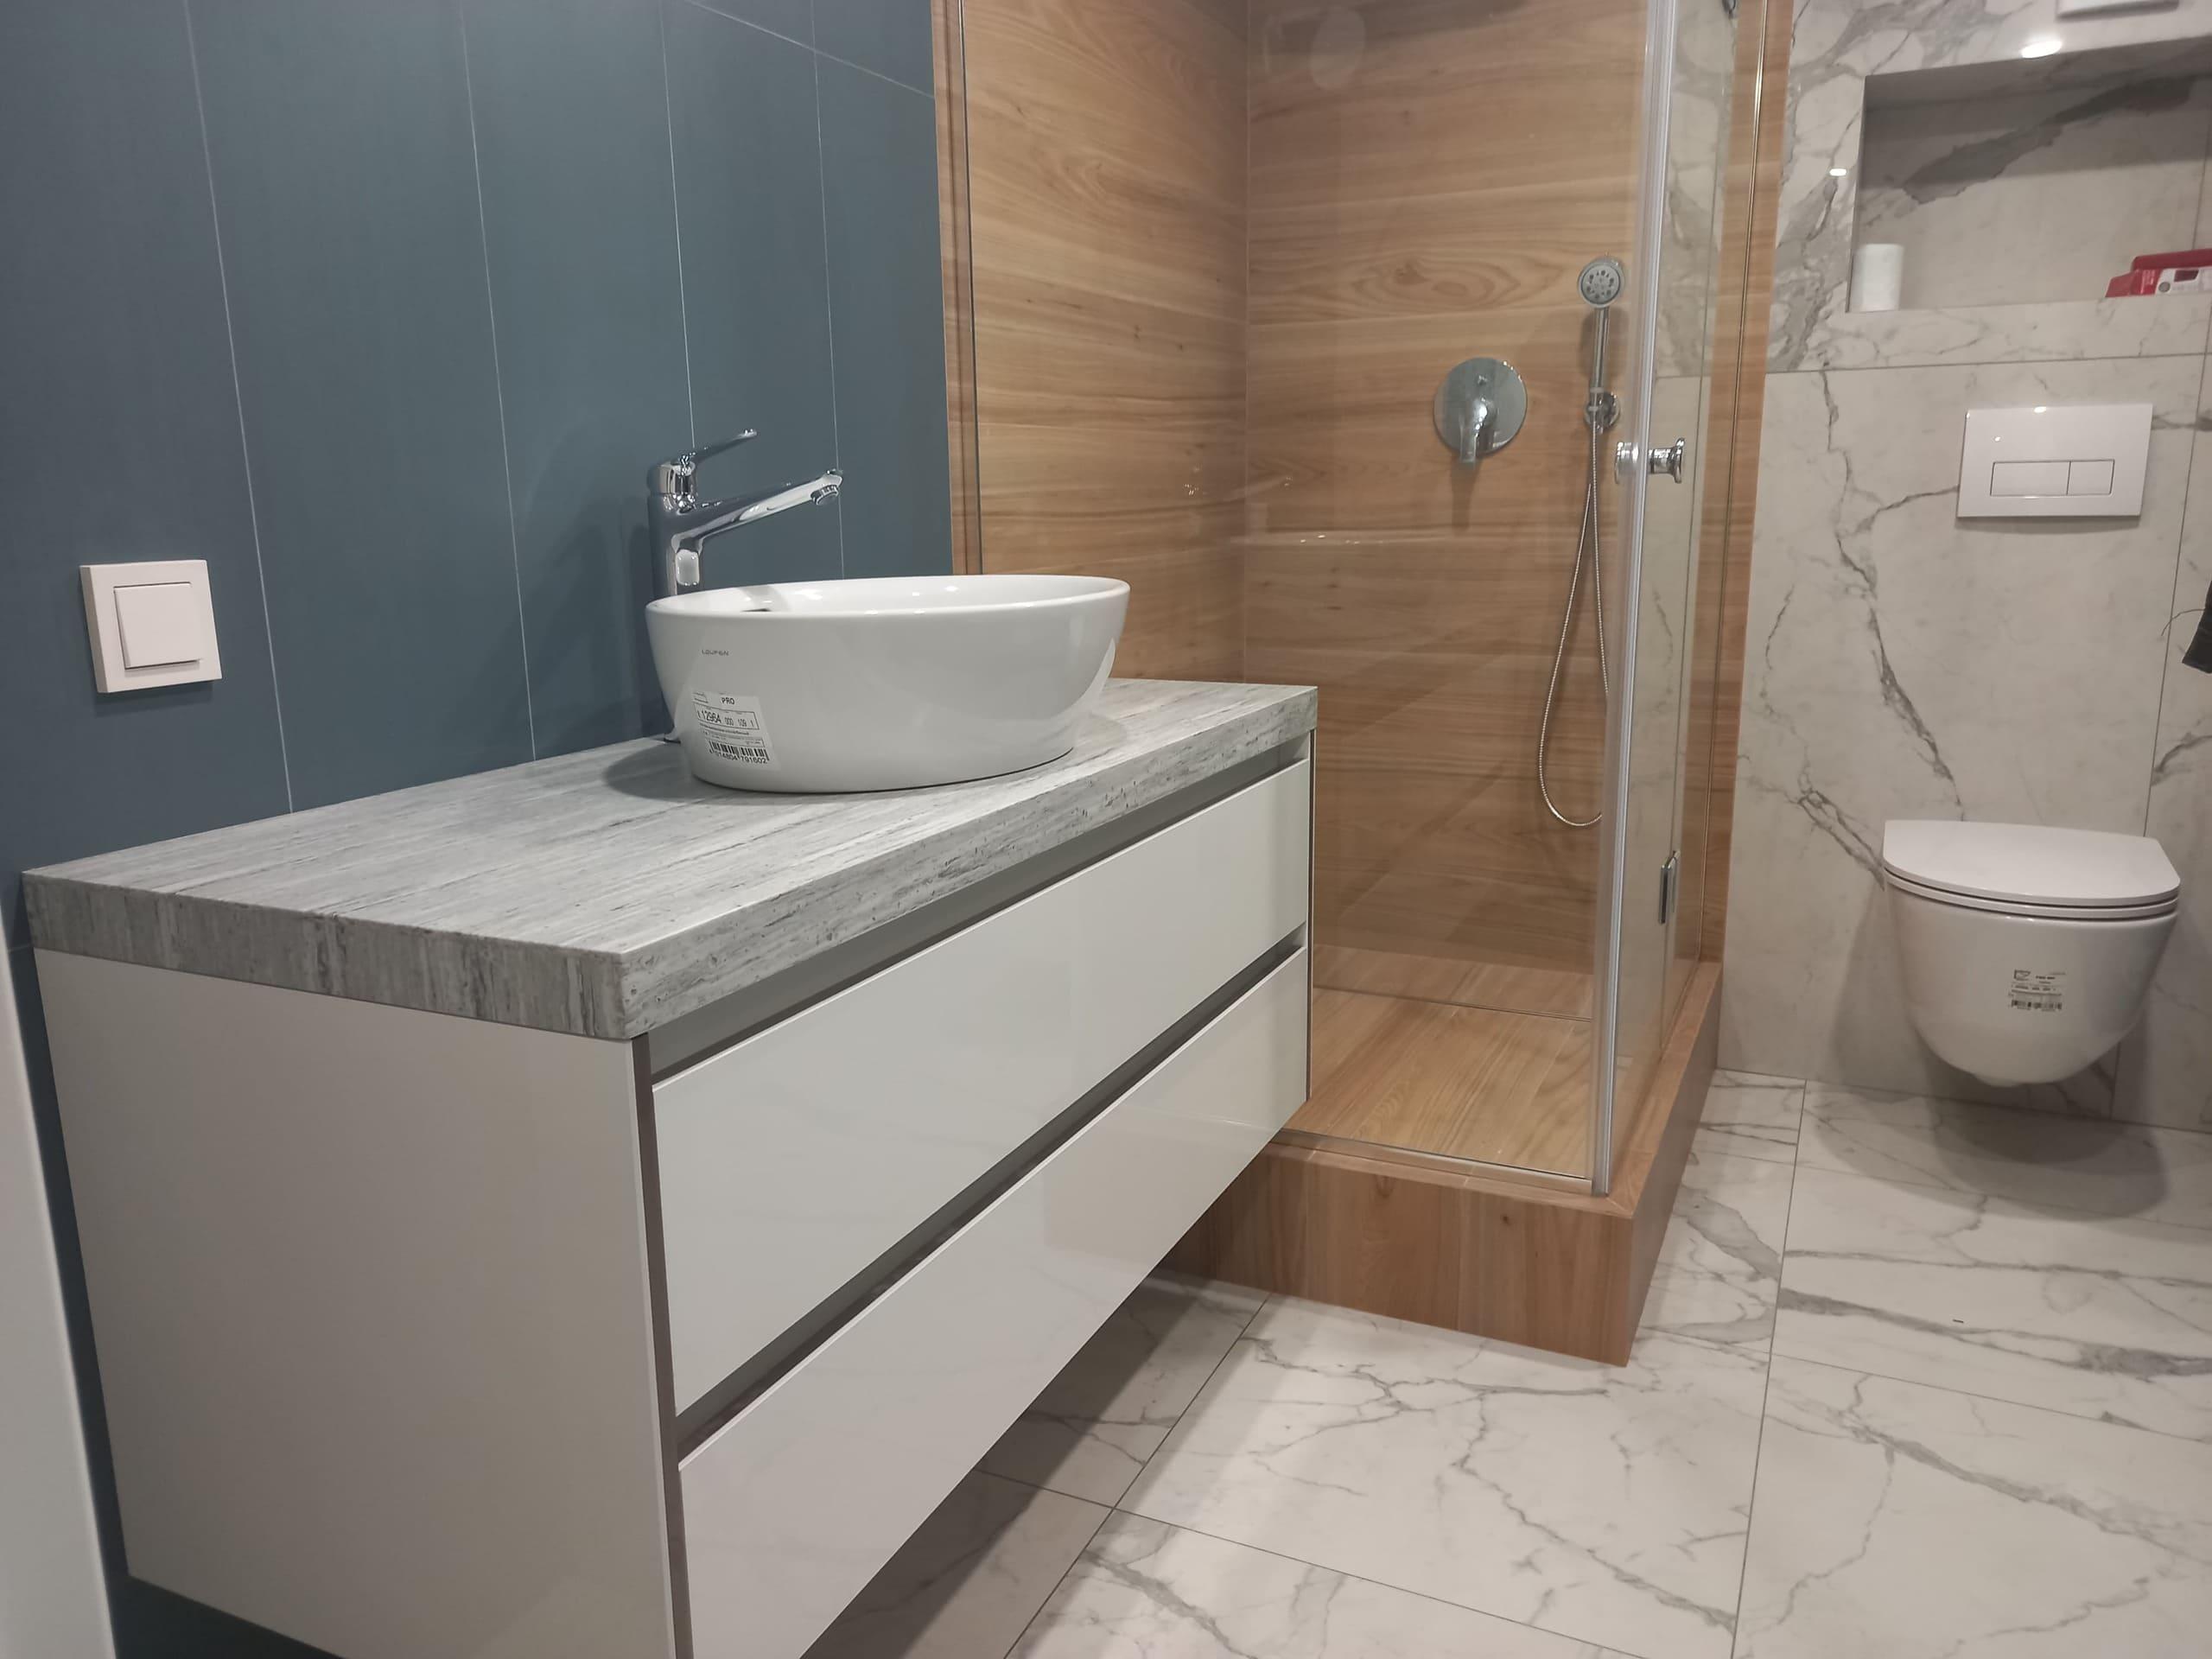 ремонт ванной комнаты в апартаментах